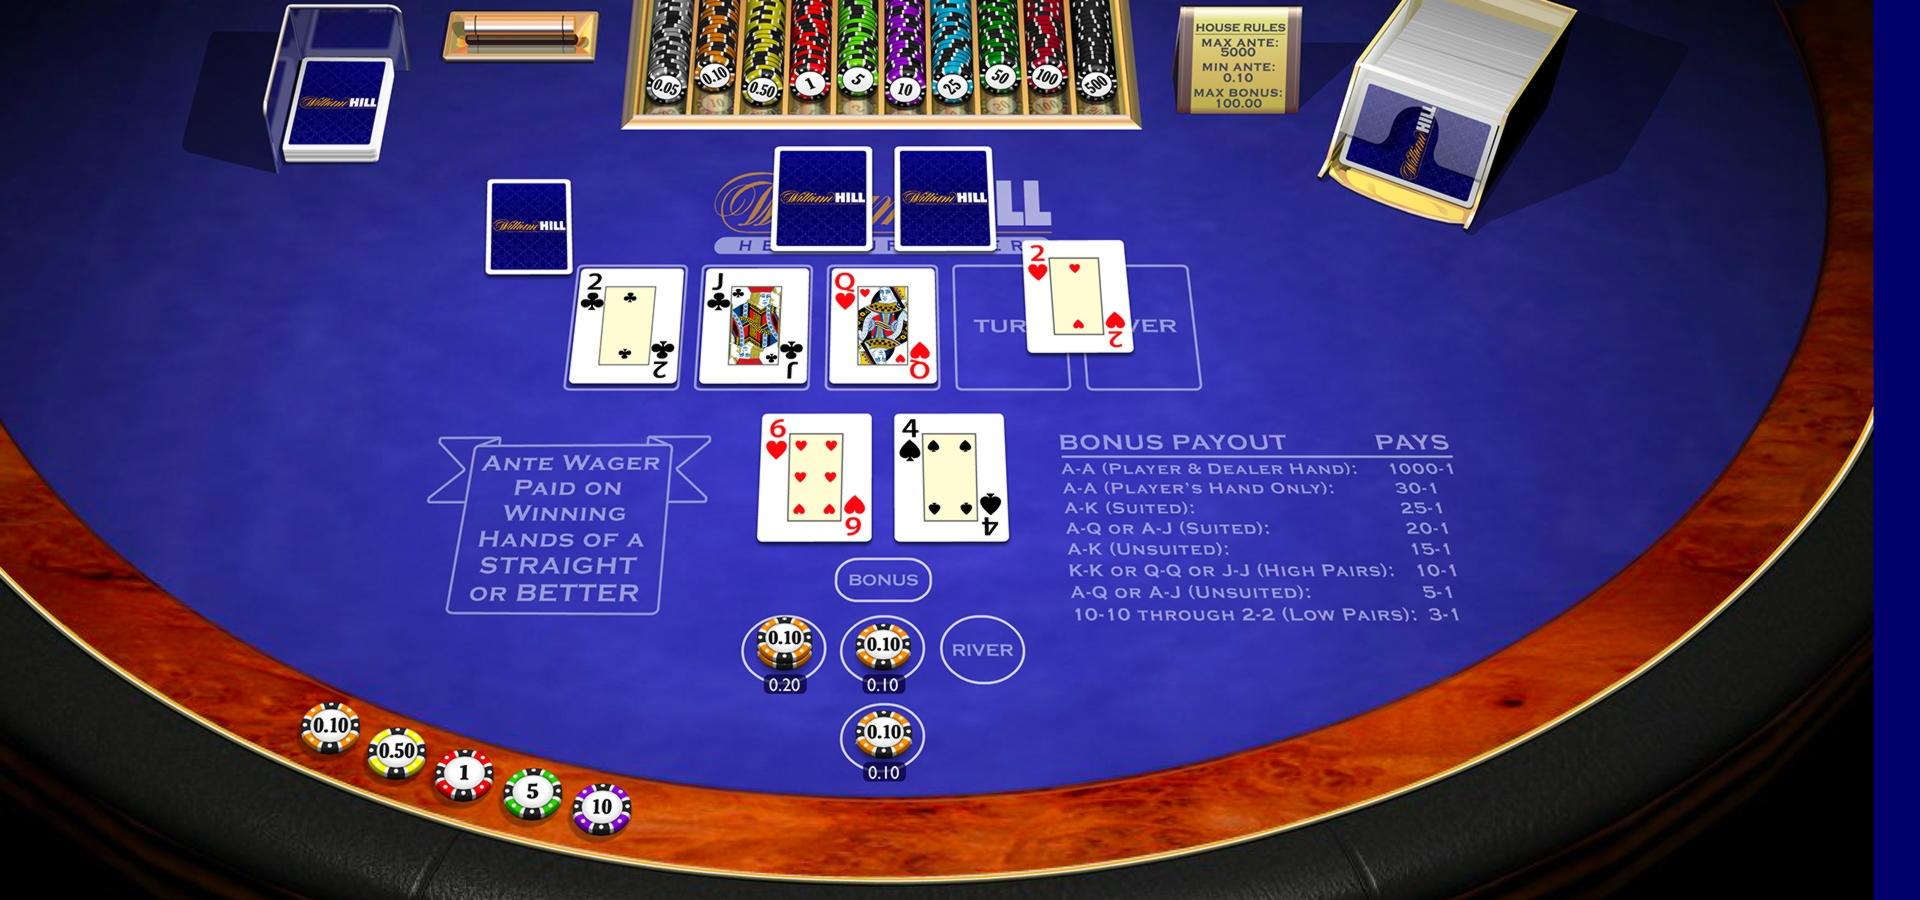 Une puce de casino 66 chez Wunderino